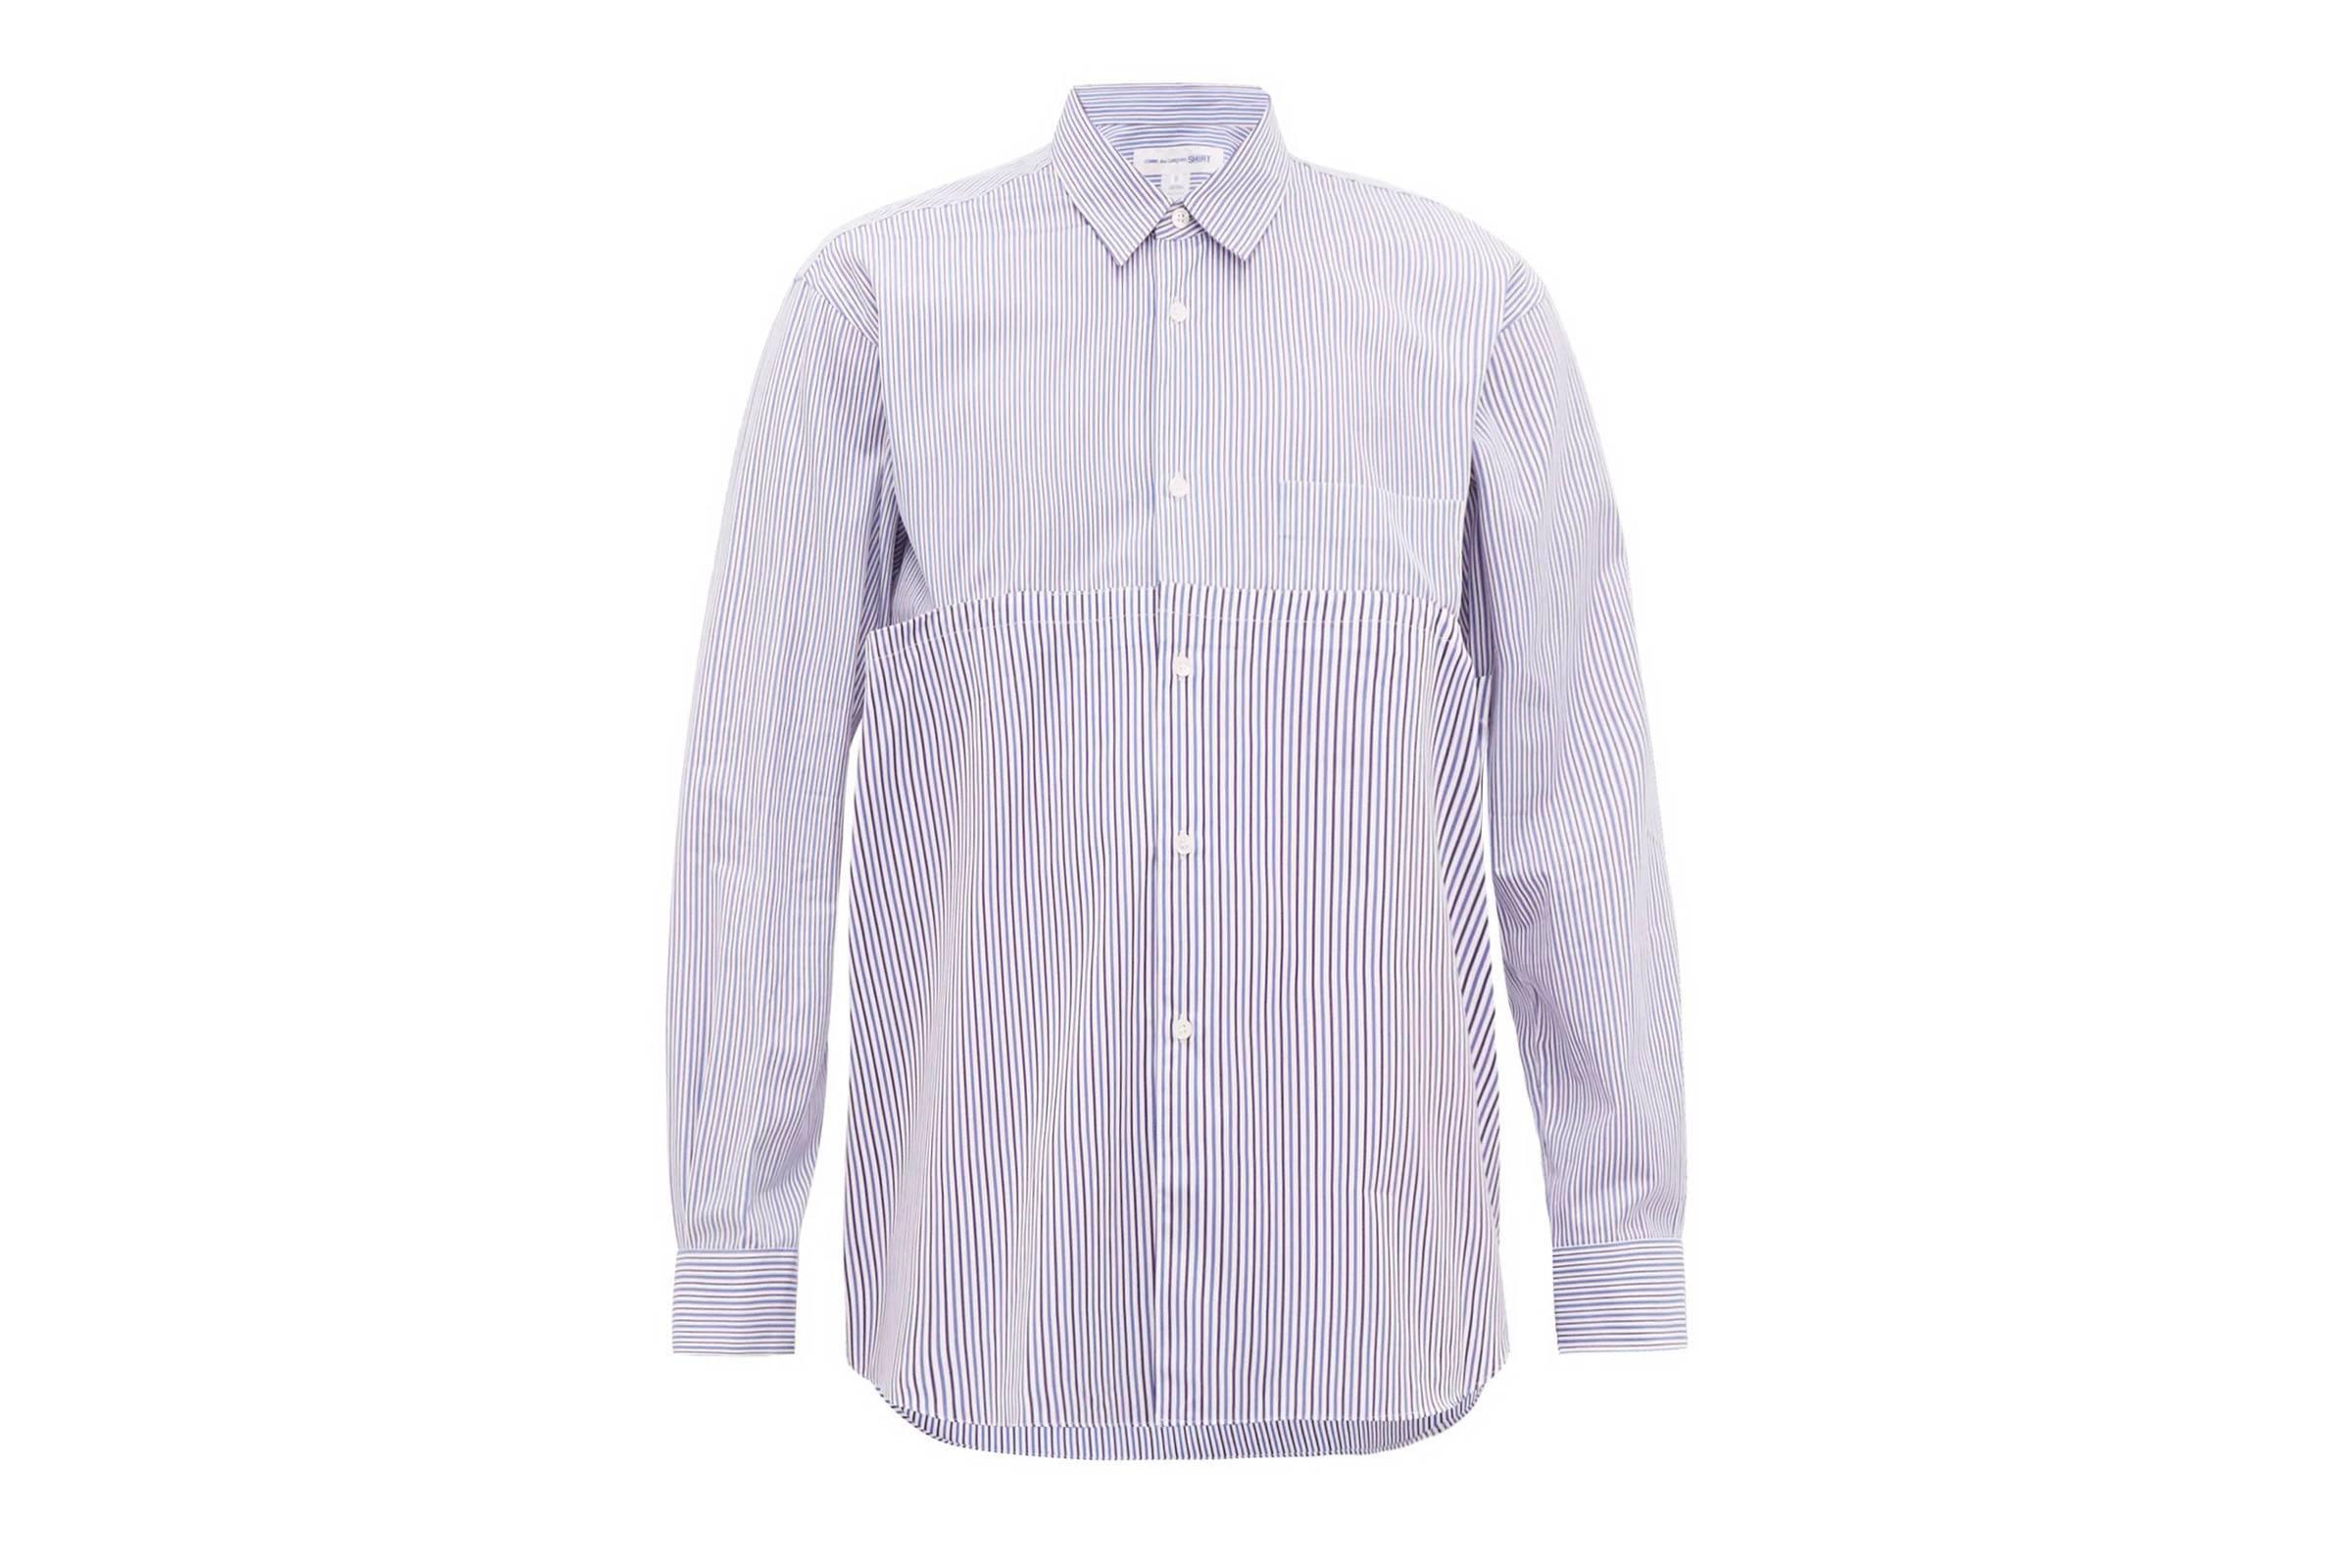 Comme des Garçons SHIRT Mismatched Striped Shirt